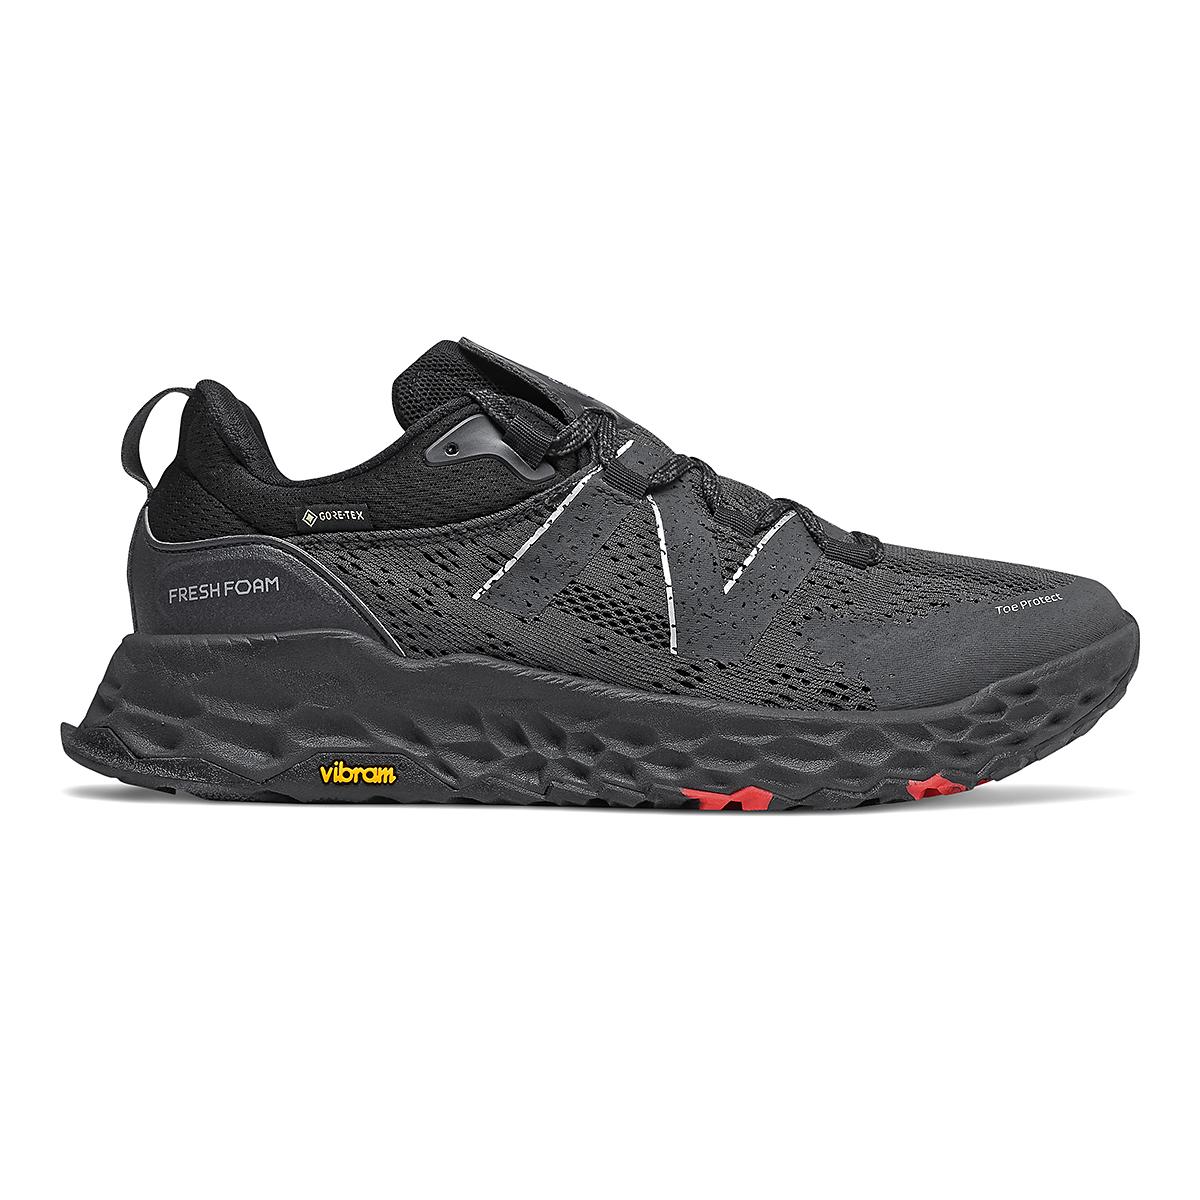 Men's New Balance Hierro V5 Gore-Tex Running Shoe - Color: Black - Size: 4.5 - Width: Wide, Black, large, image 1